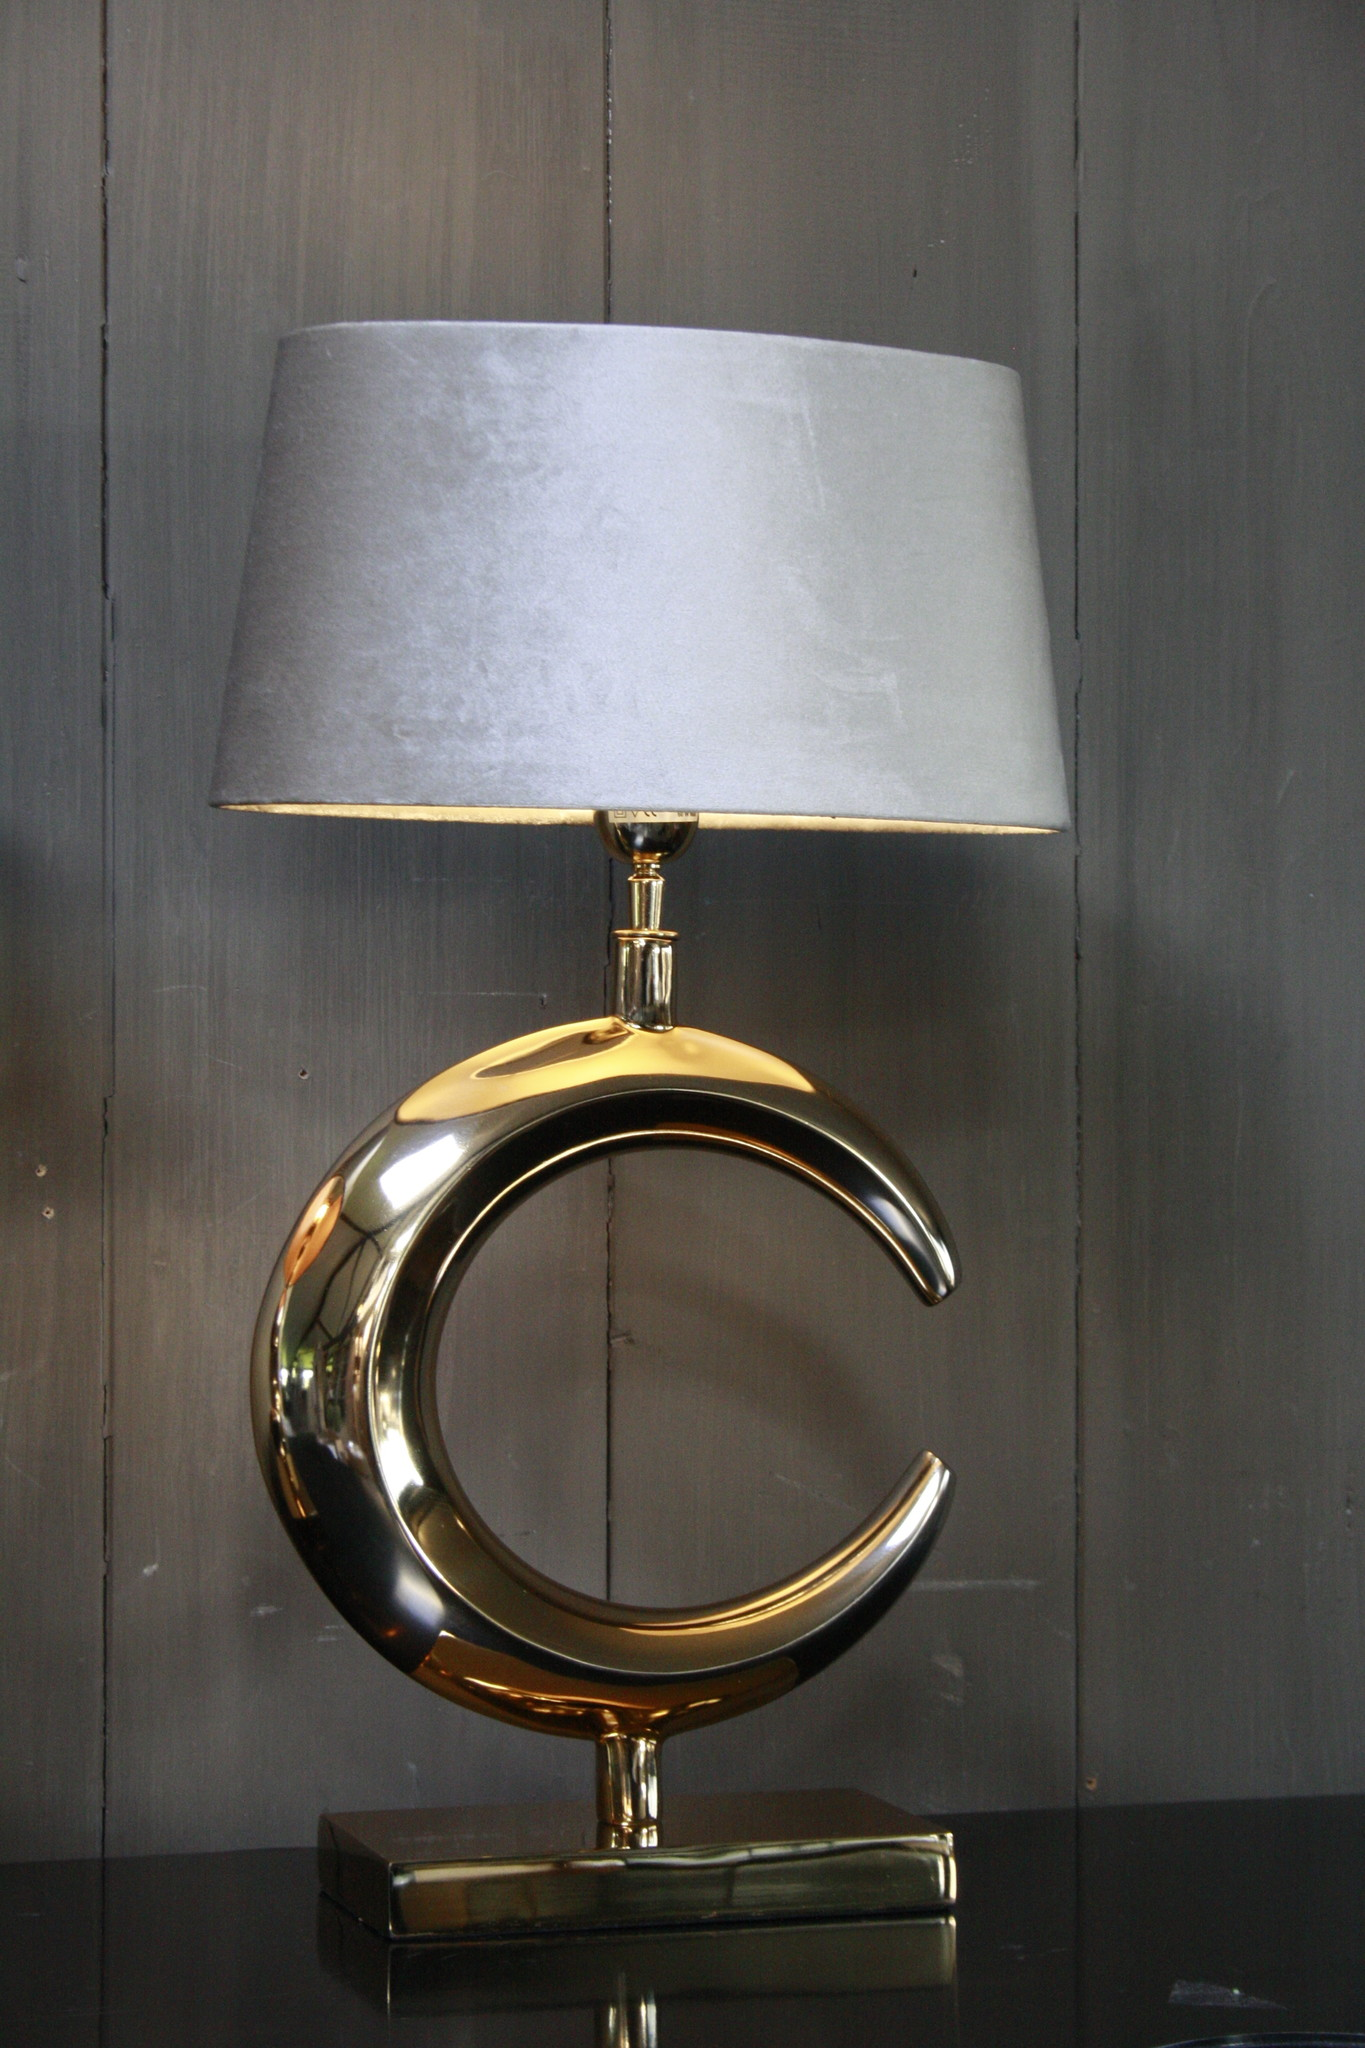 Tafellamp Goud Rond + Velours kap Eric Kuster-2